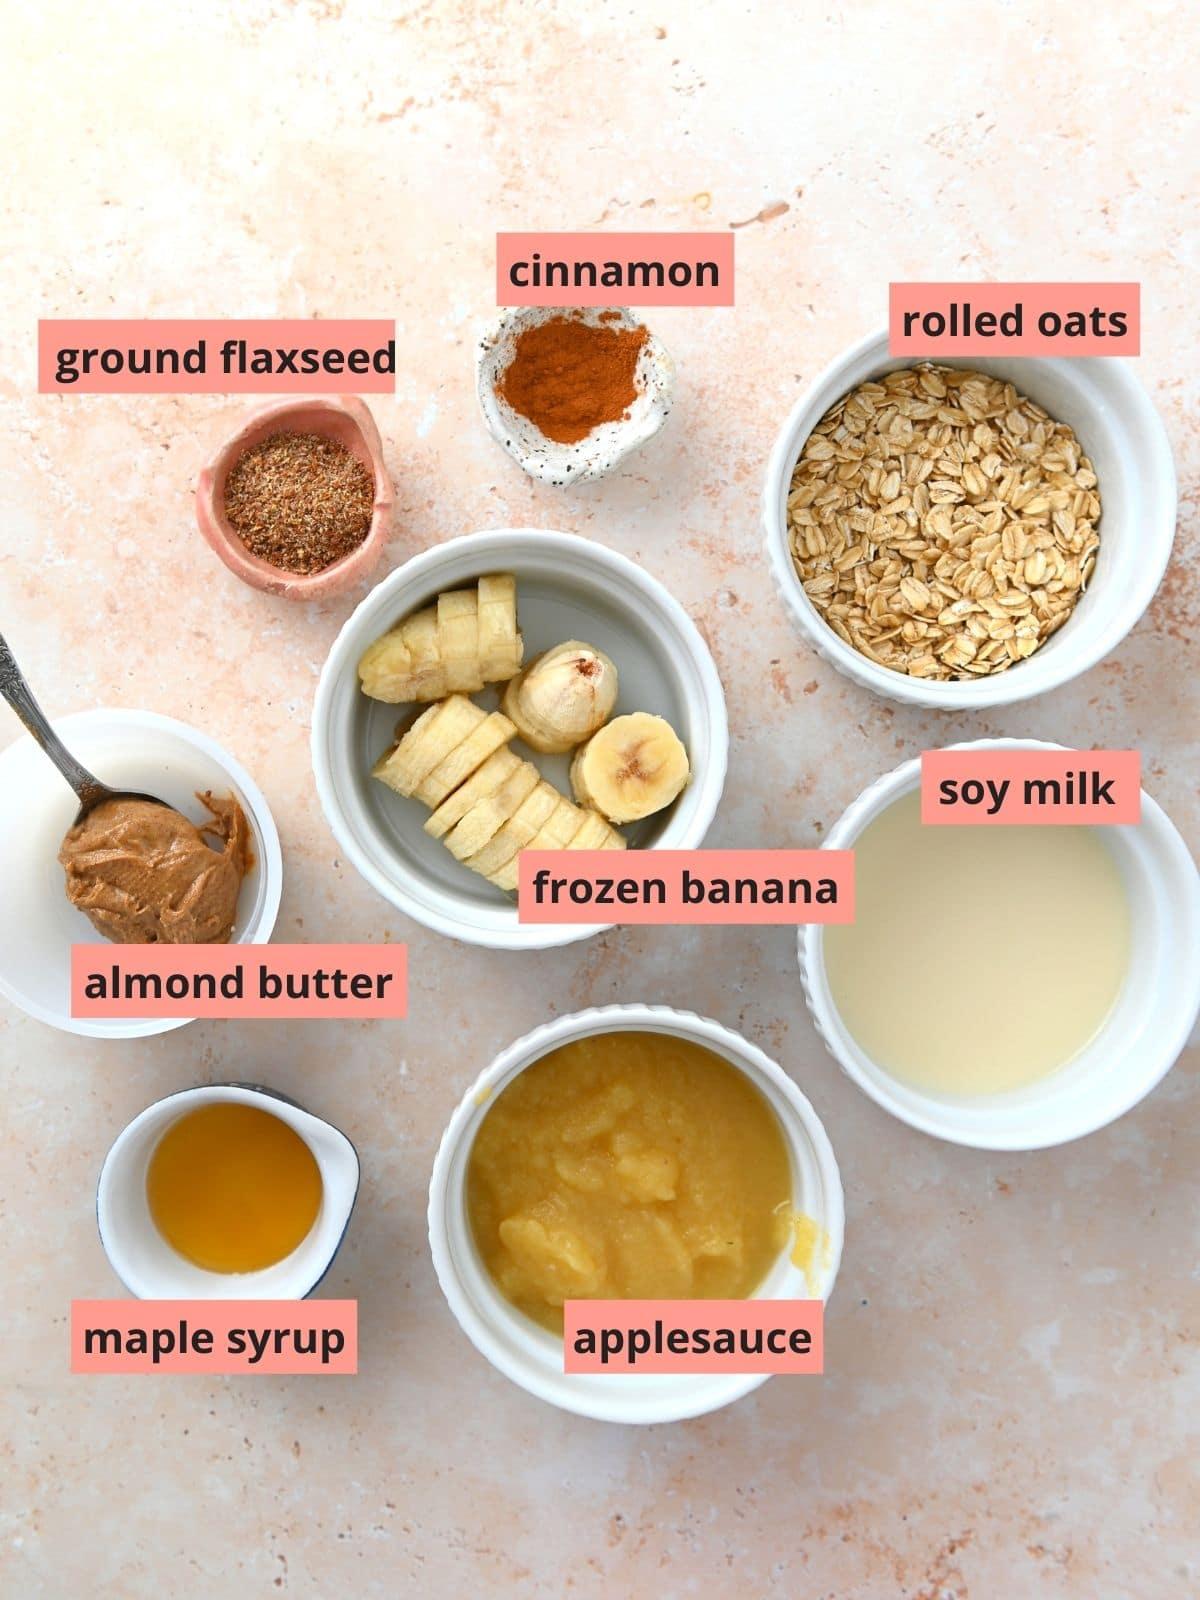 Labeled ingredients used to make apple cinnamon smoothies